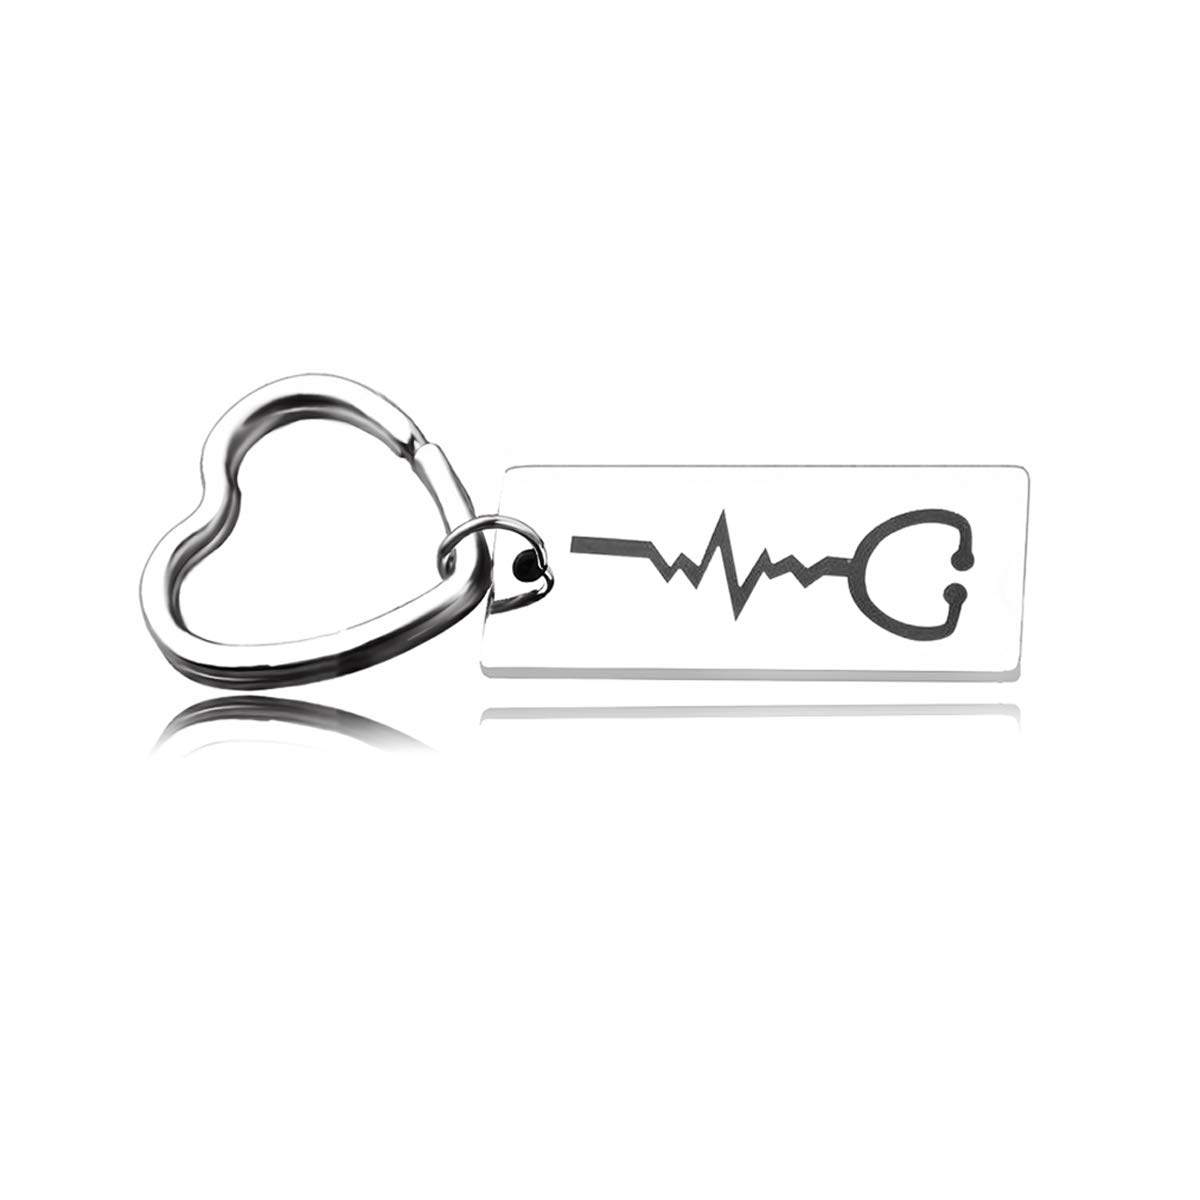 RUNXINTD Rose Gold Heartbeat Cuff Bracelet Stethoscope Bracelet Nurse Graduation Gift, for Nurse Doctor (Stethoscope-Keychain)